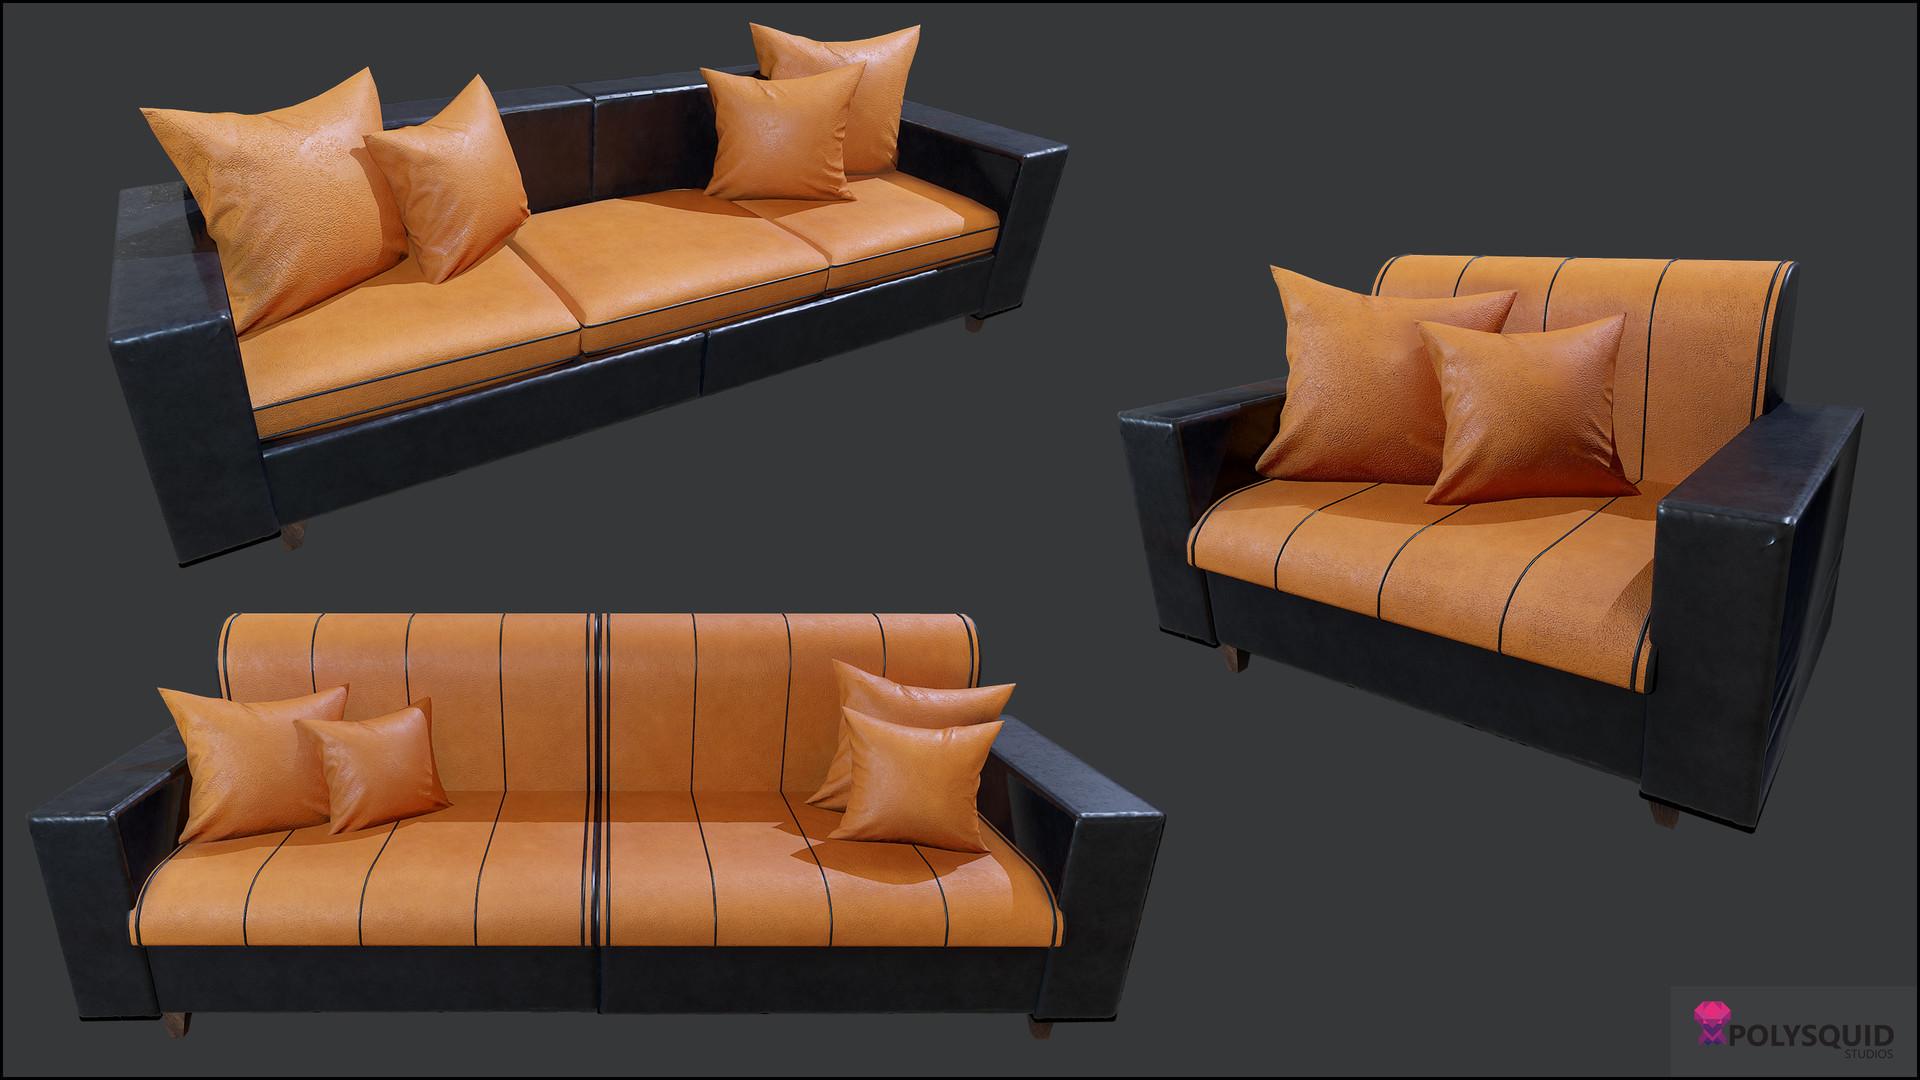 Poly squid florin bisca modular sofa02